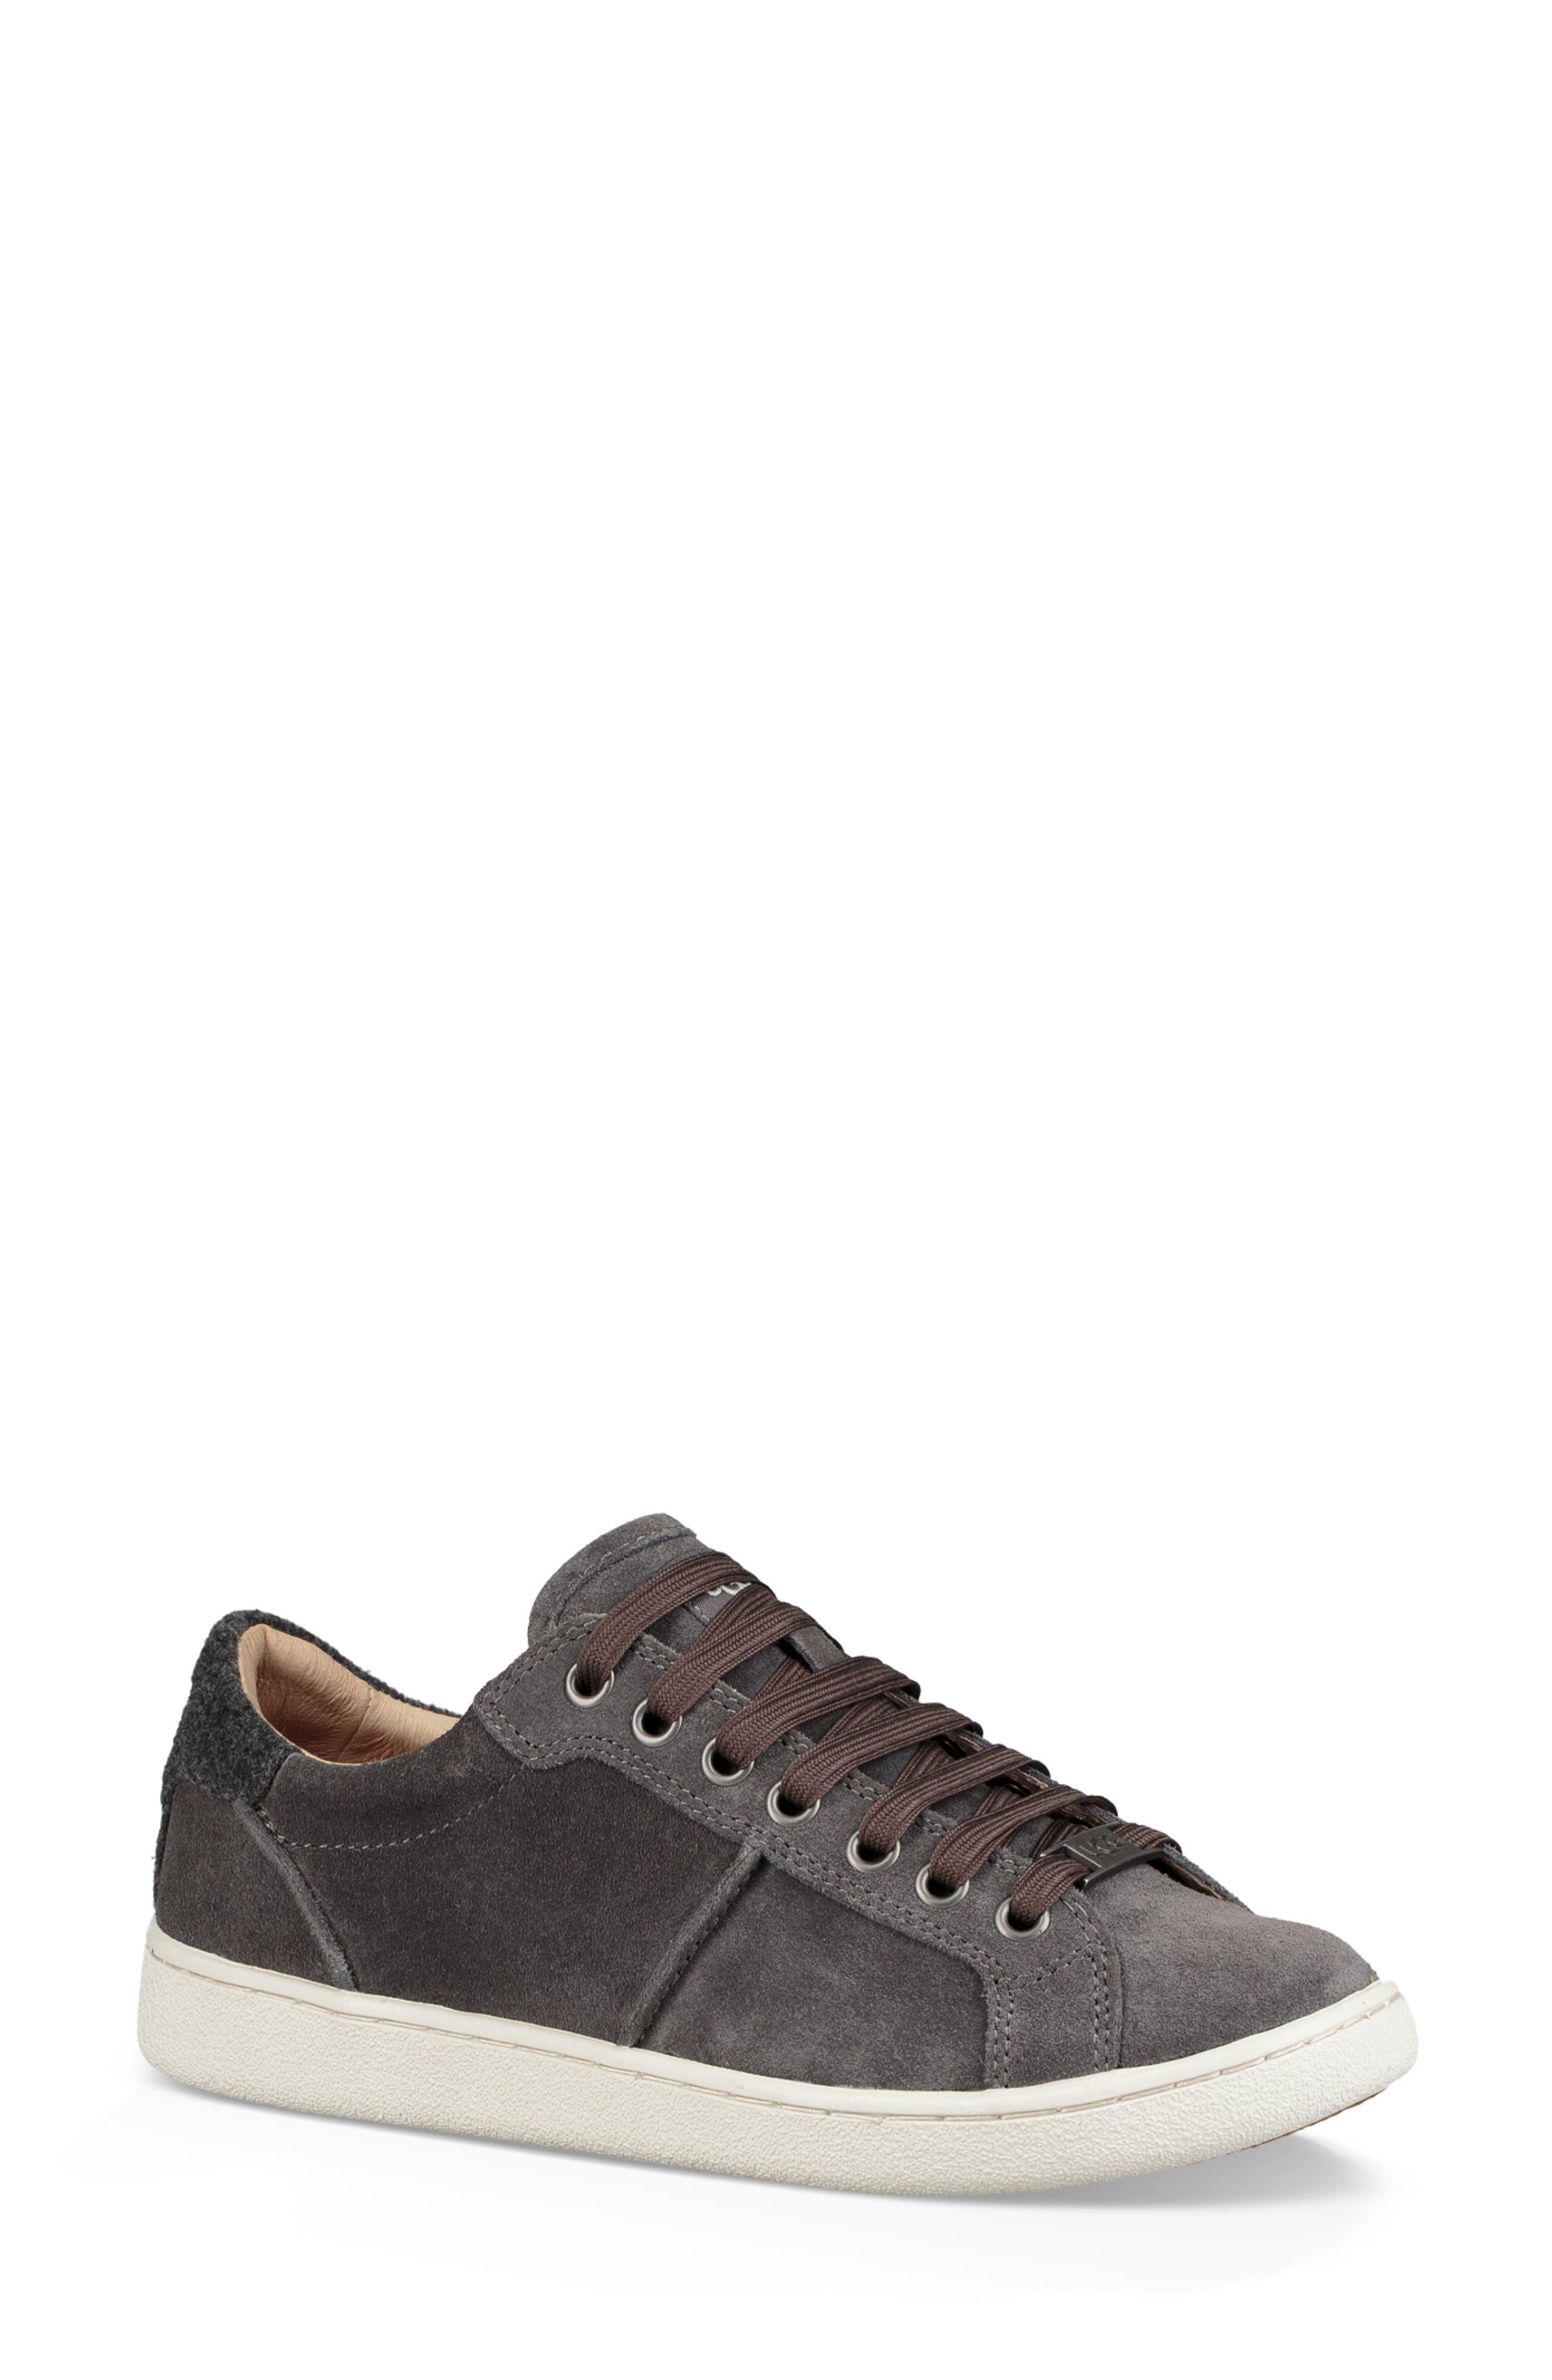 Milo Sneaker,                             Alternate thumbnail 7, color,                             CHARCOAL SUEDE